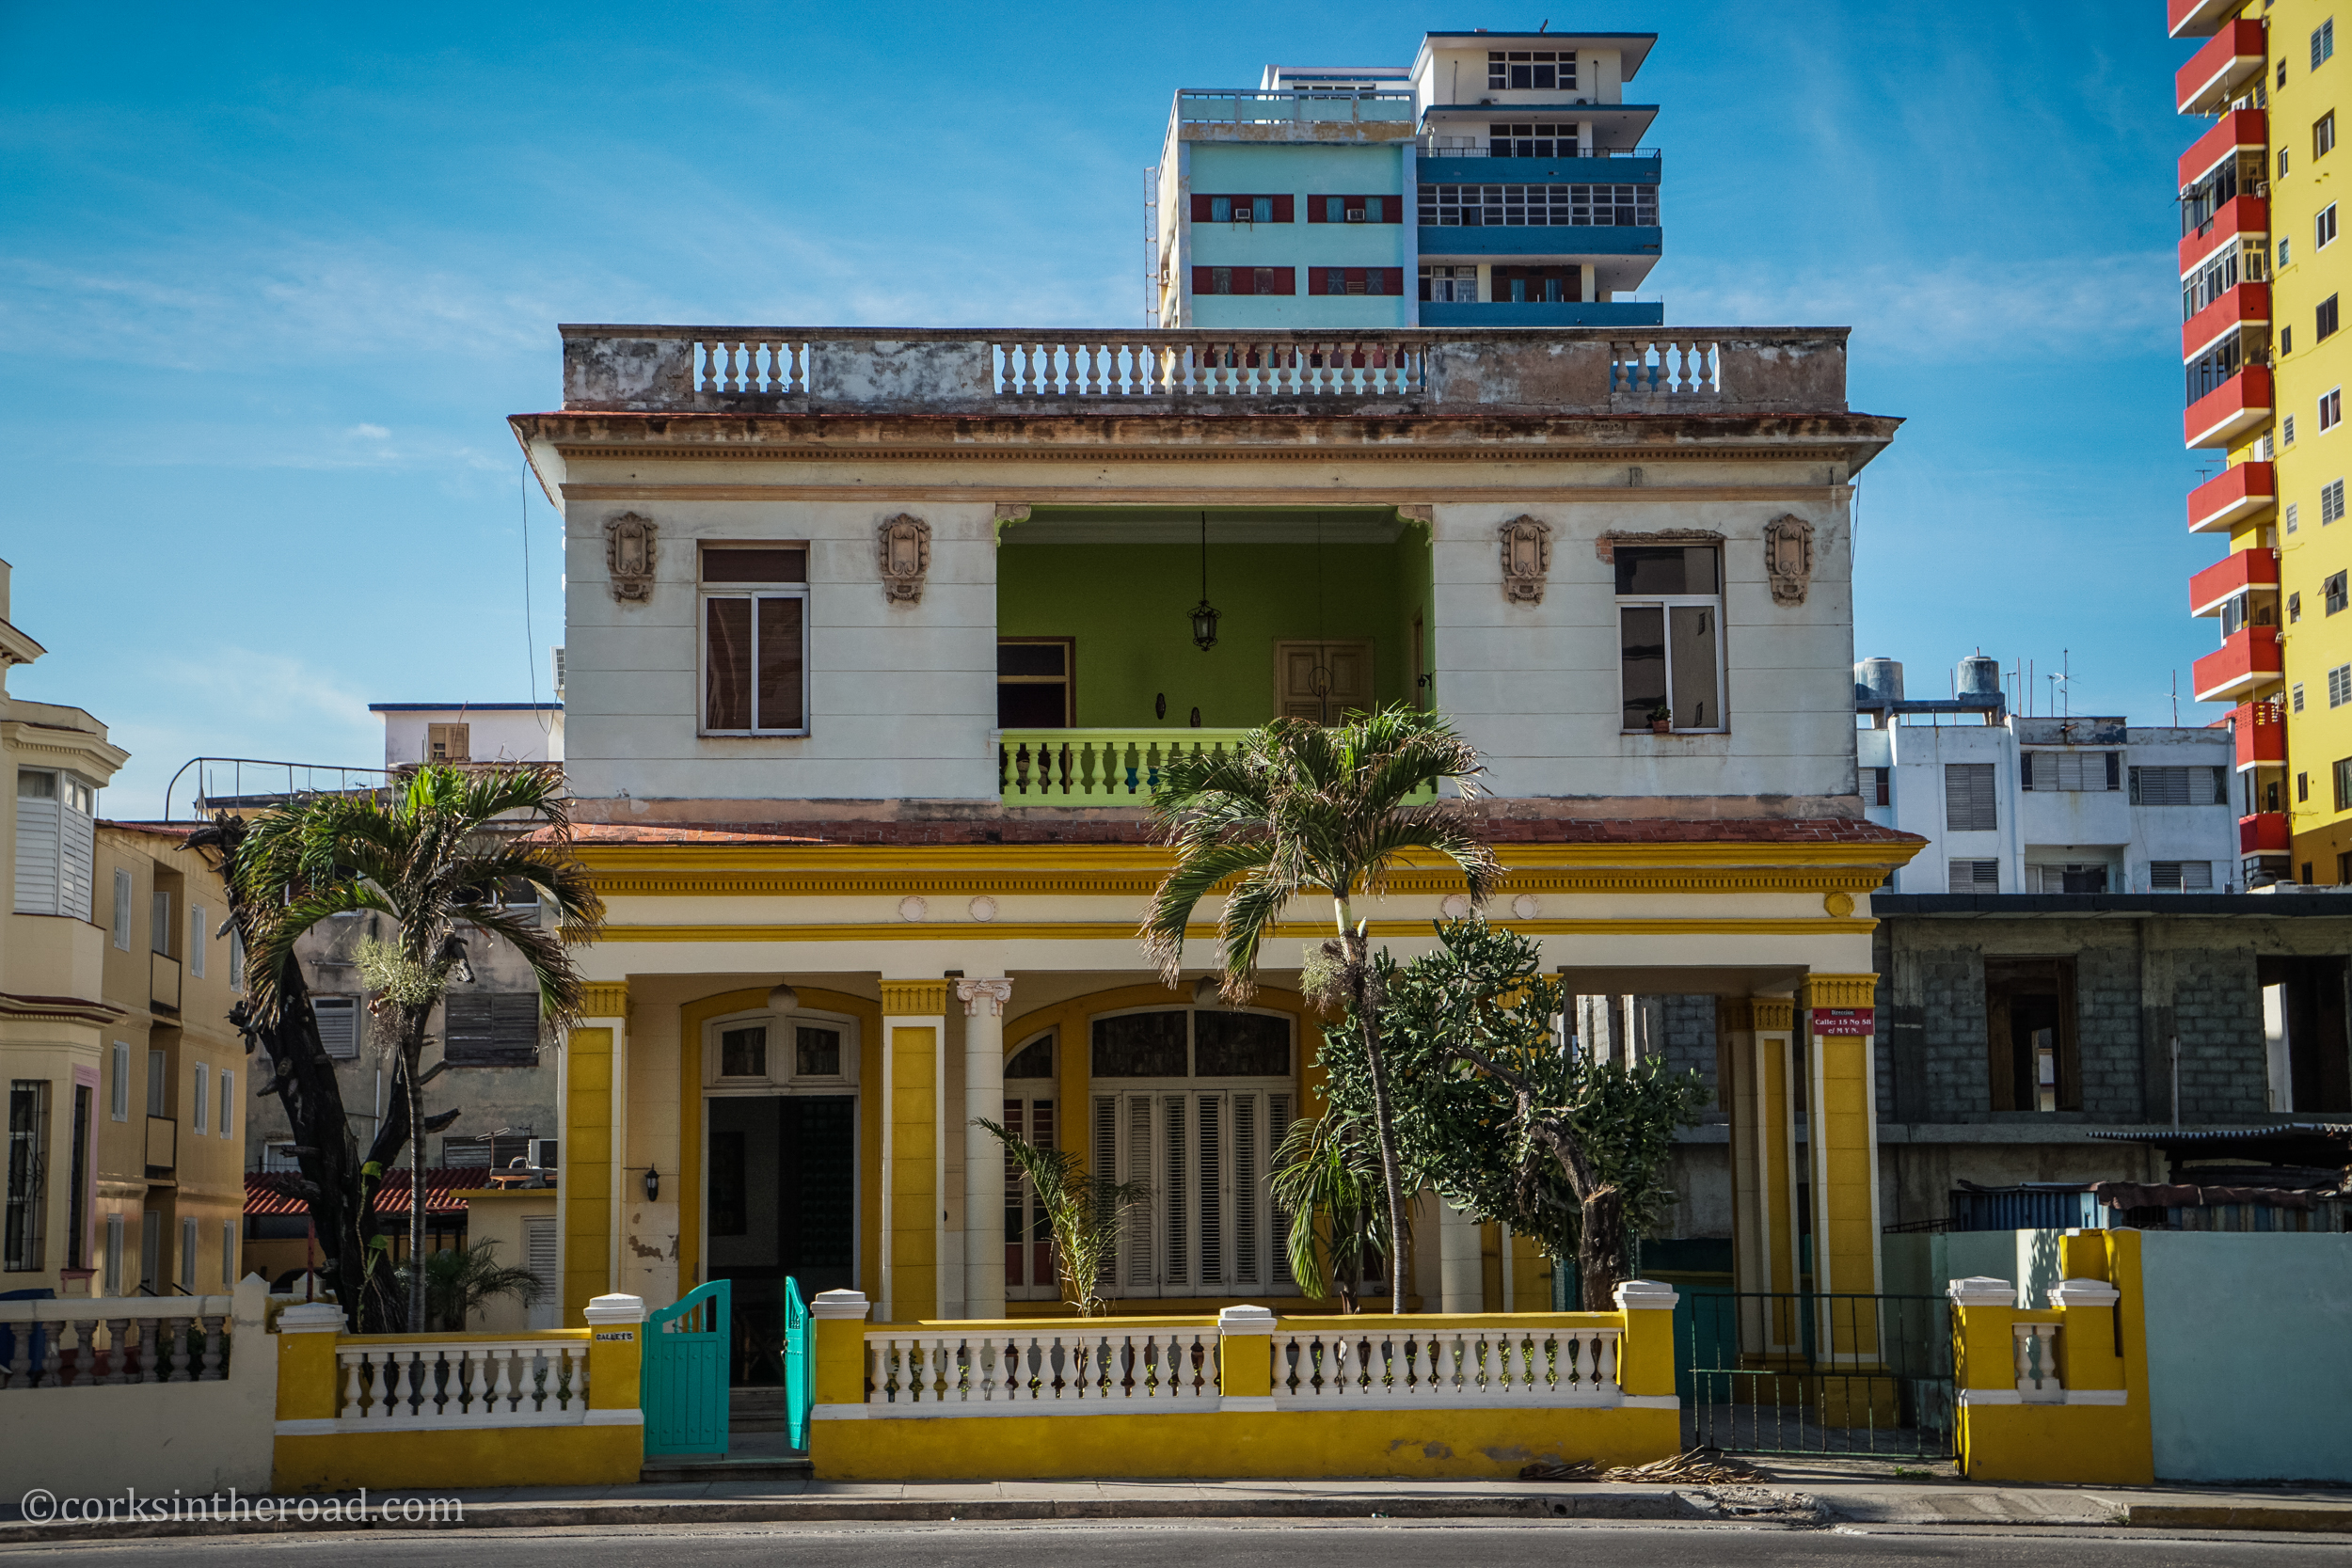 Architecture, Corksintheroad, Cuba, Havana-20.jpg